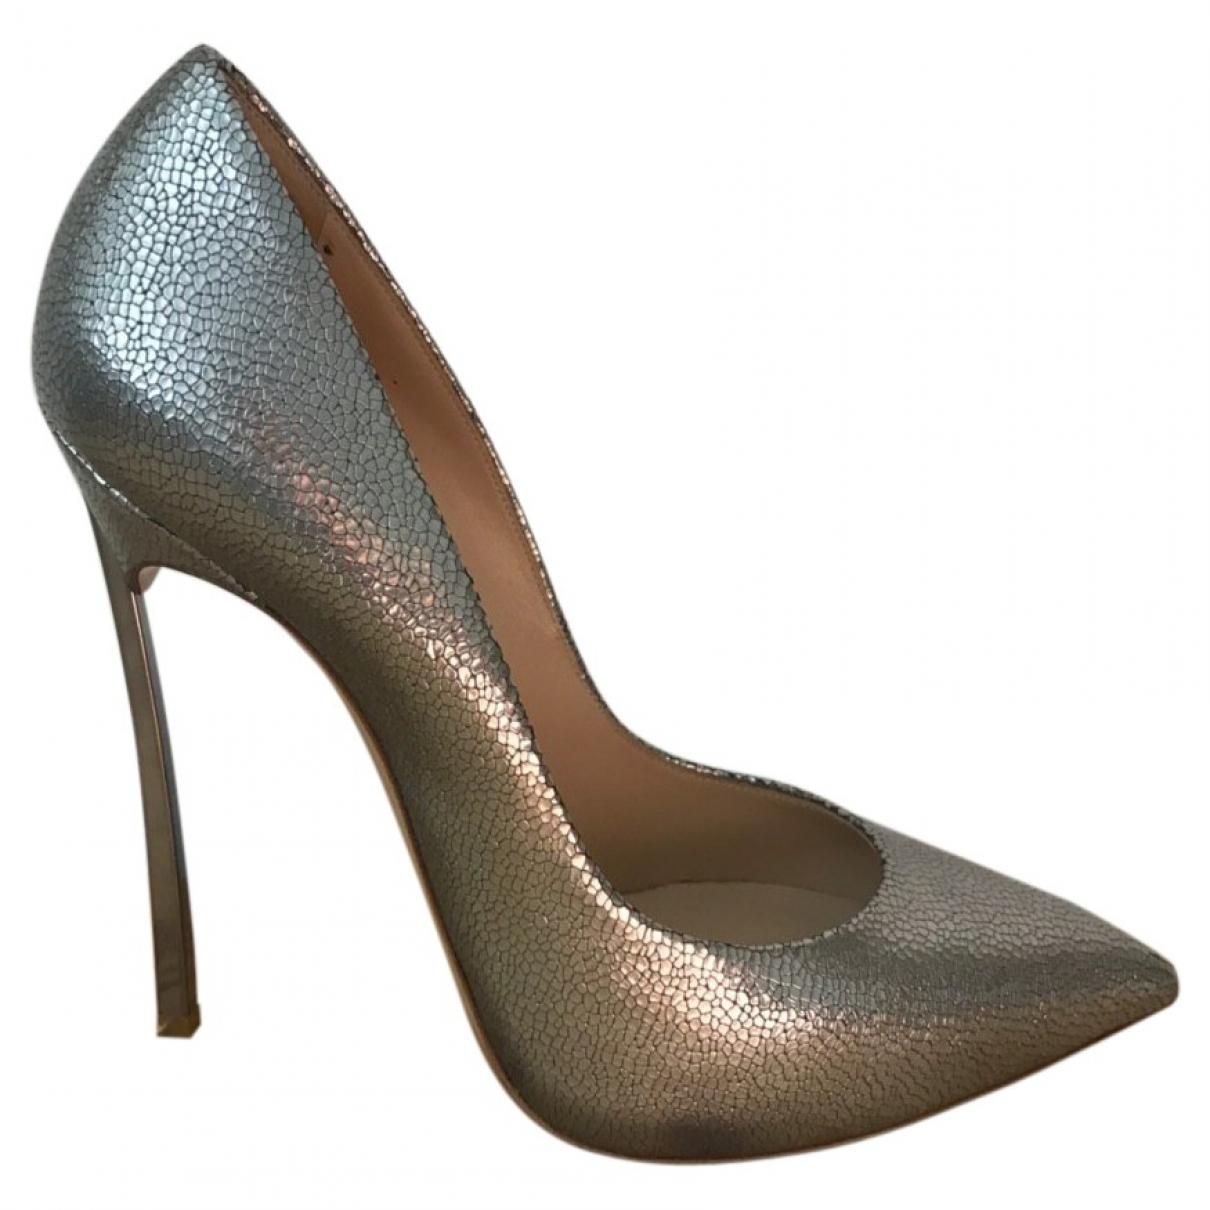 Casadei \N Metallic Leather Heels for Women 39 EU